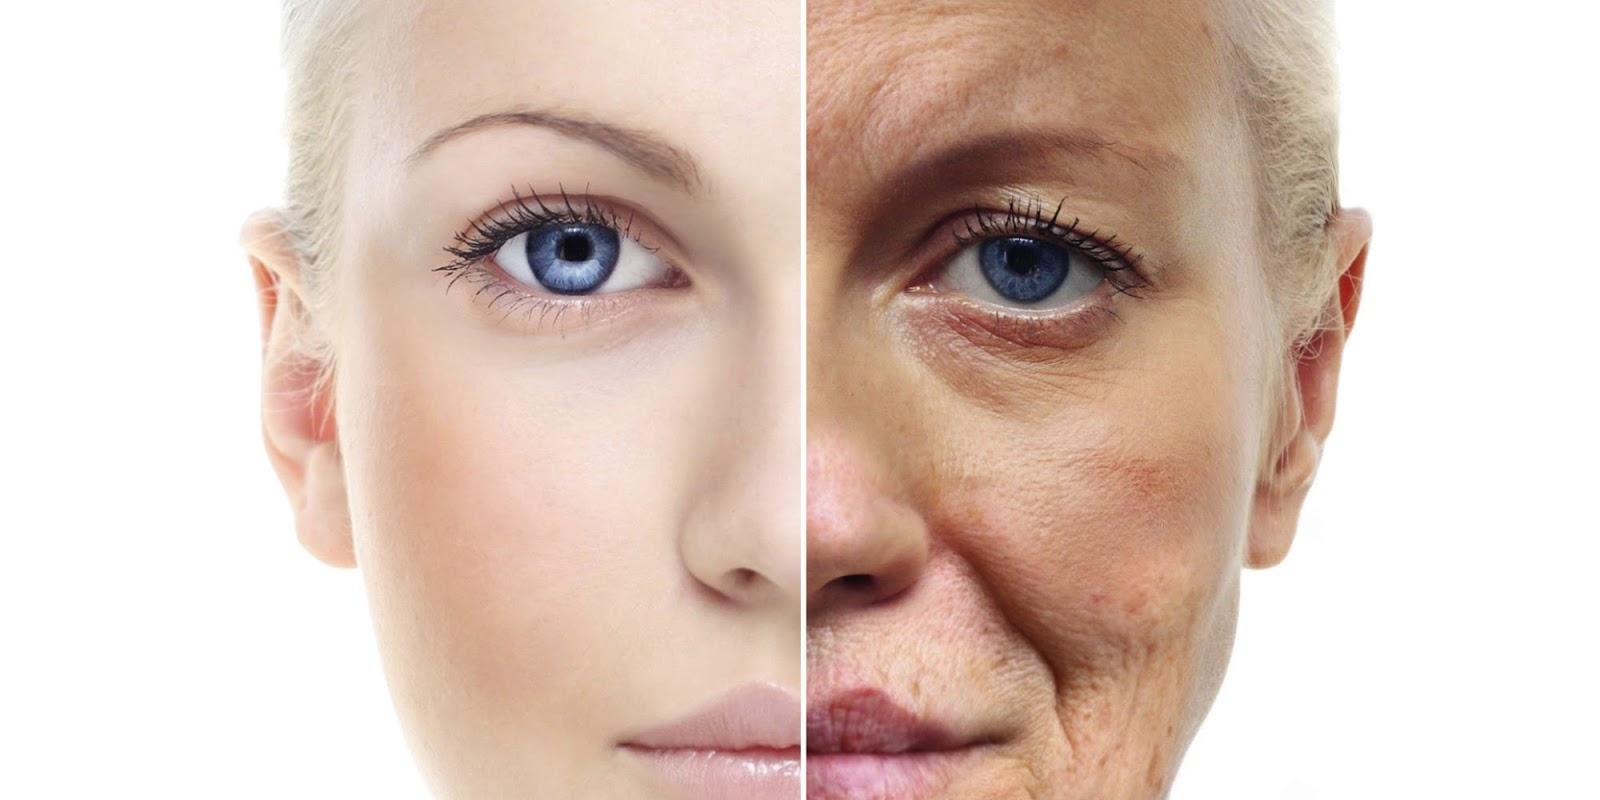 30 Manfaat Santan Kelapa Bagi Kesehatan dan Kecantikan Yang Wajib Anda Ketahui 12